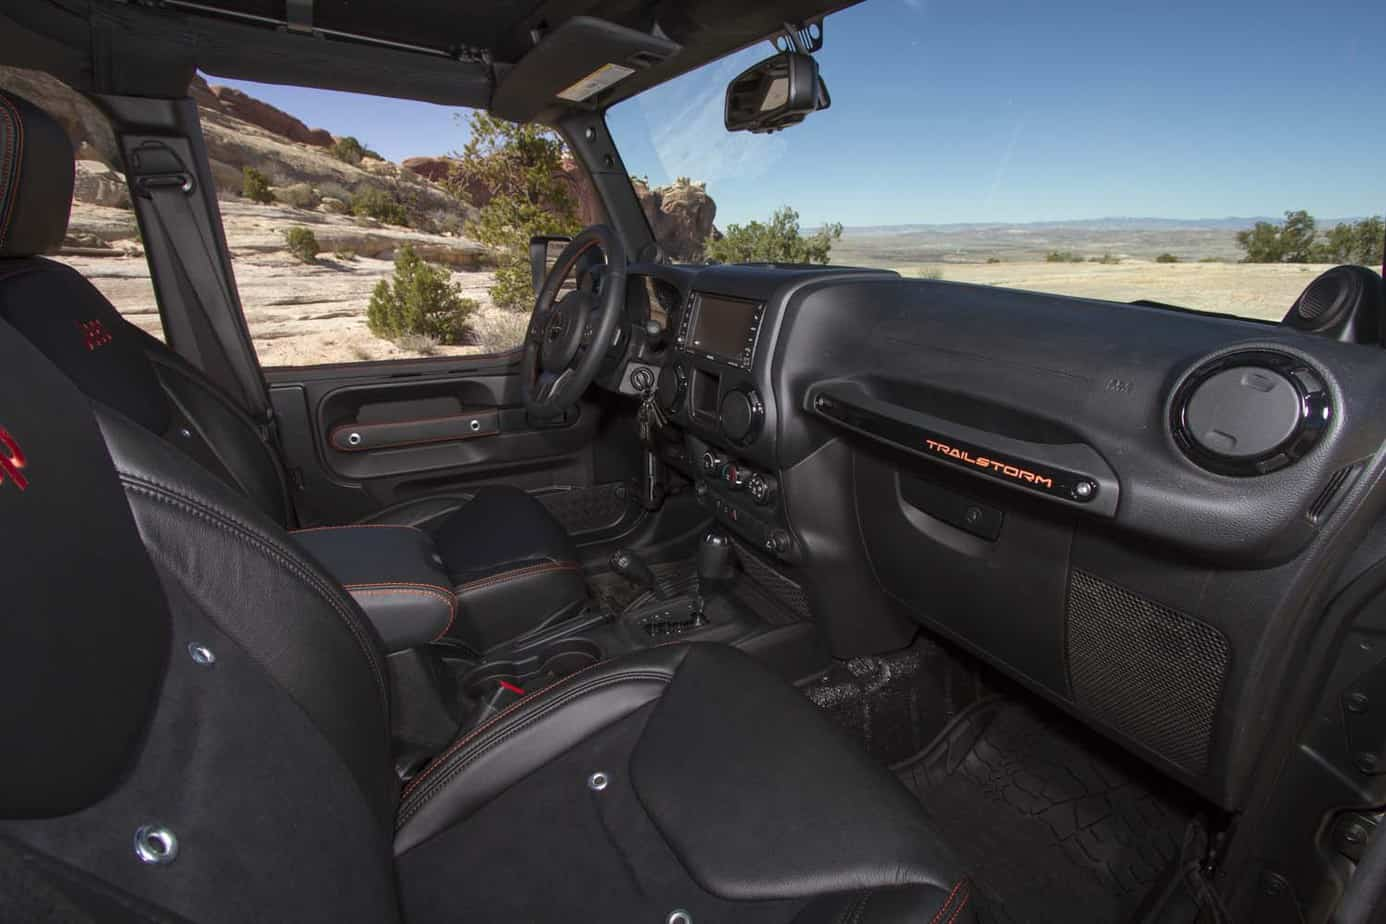 Jeep Trailstorm 026